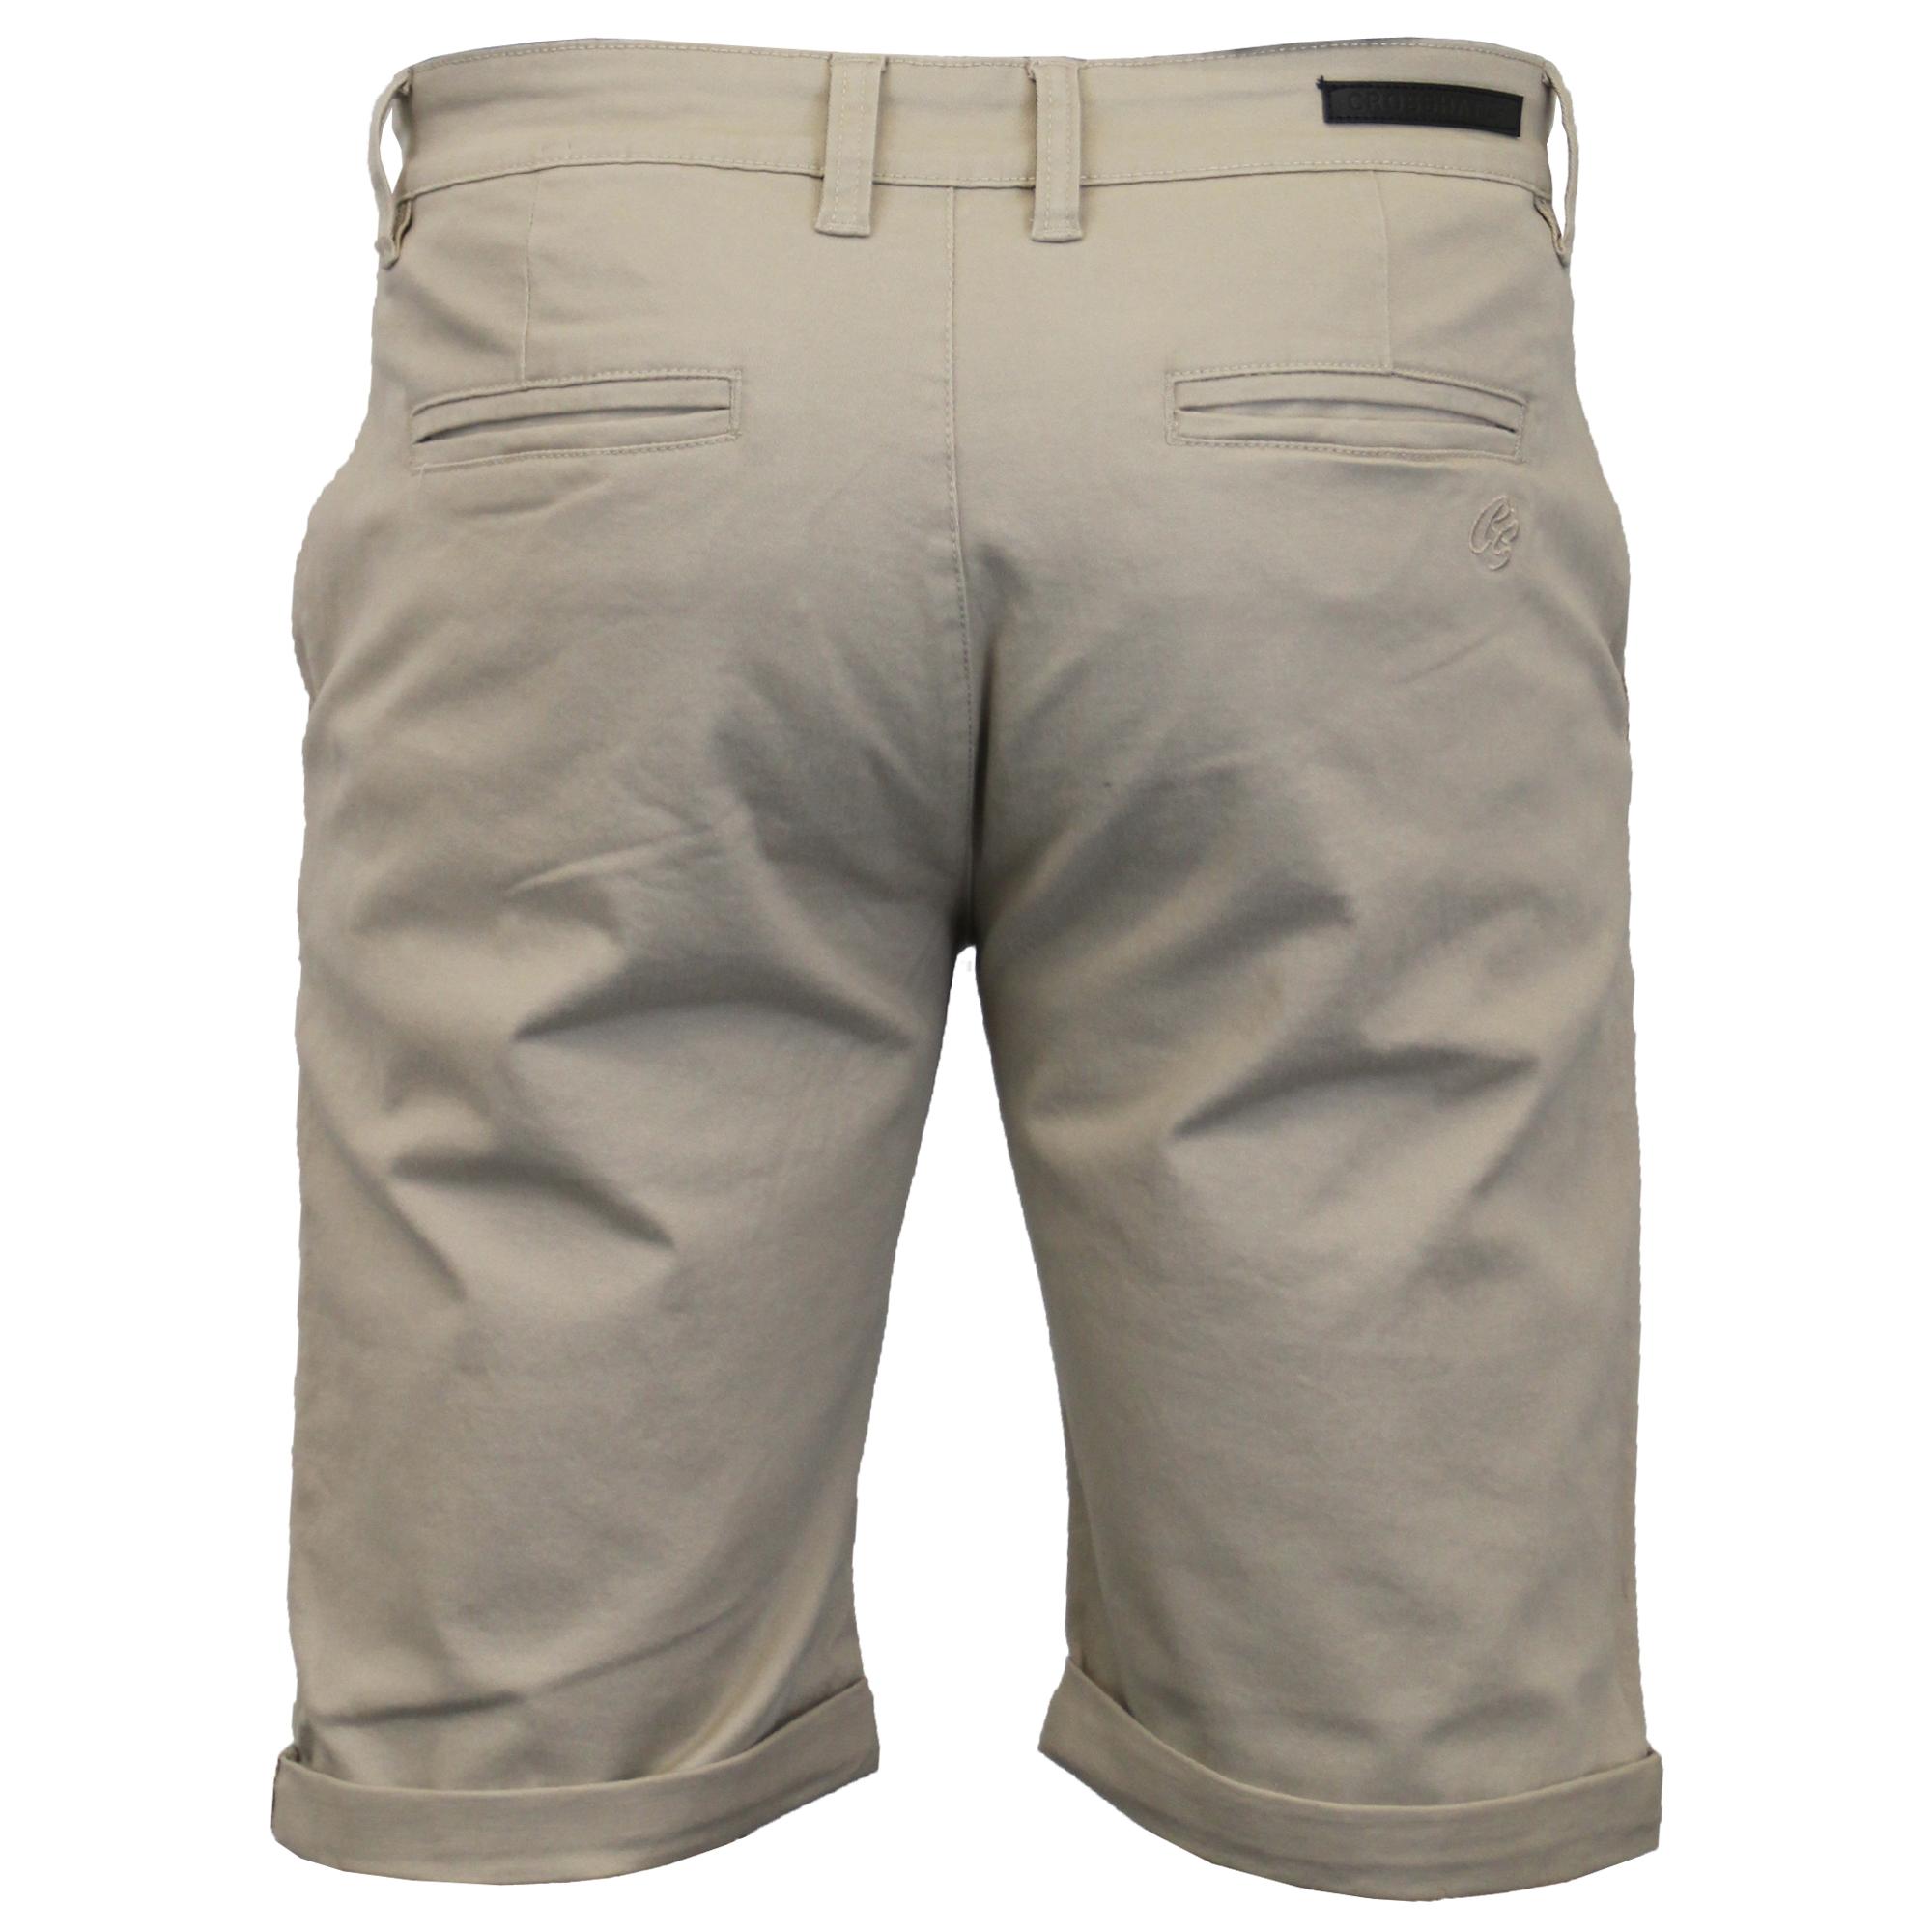 thumbnail 12 - Mens-Chino-Shorts-Crosshatch-Brandons-Knee-Length-Fastrack-Roll-Up-Summer-New